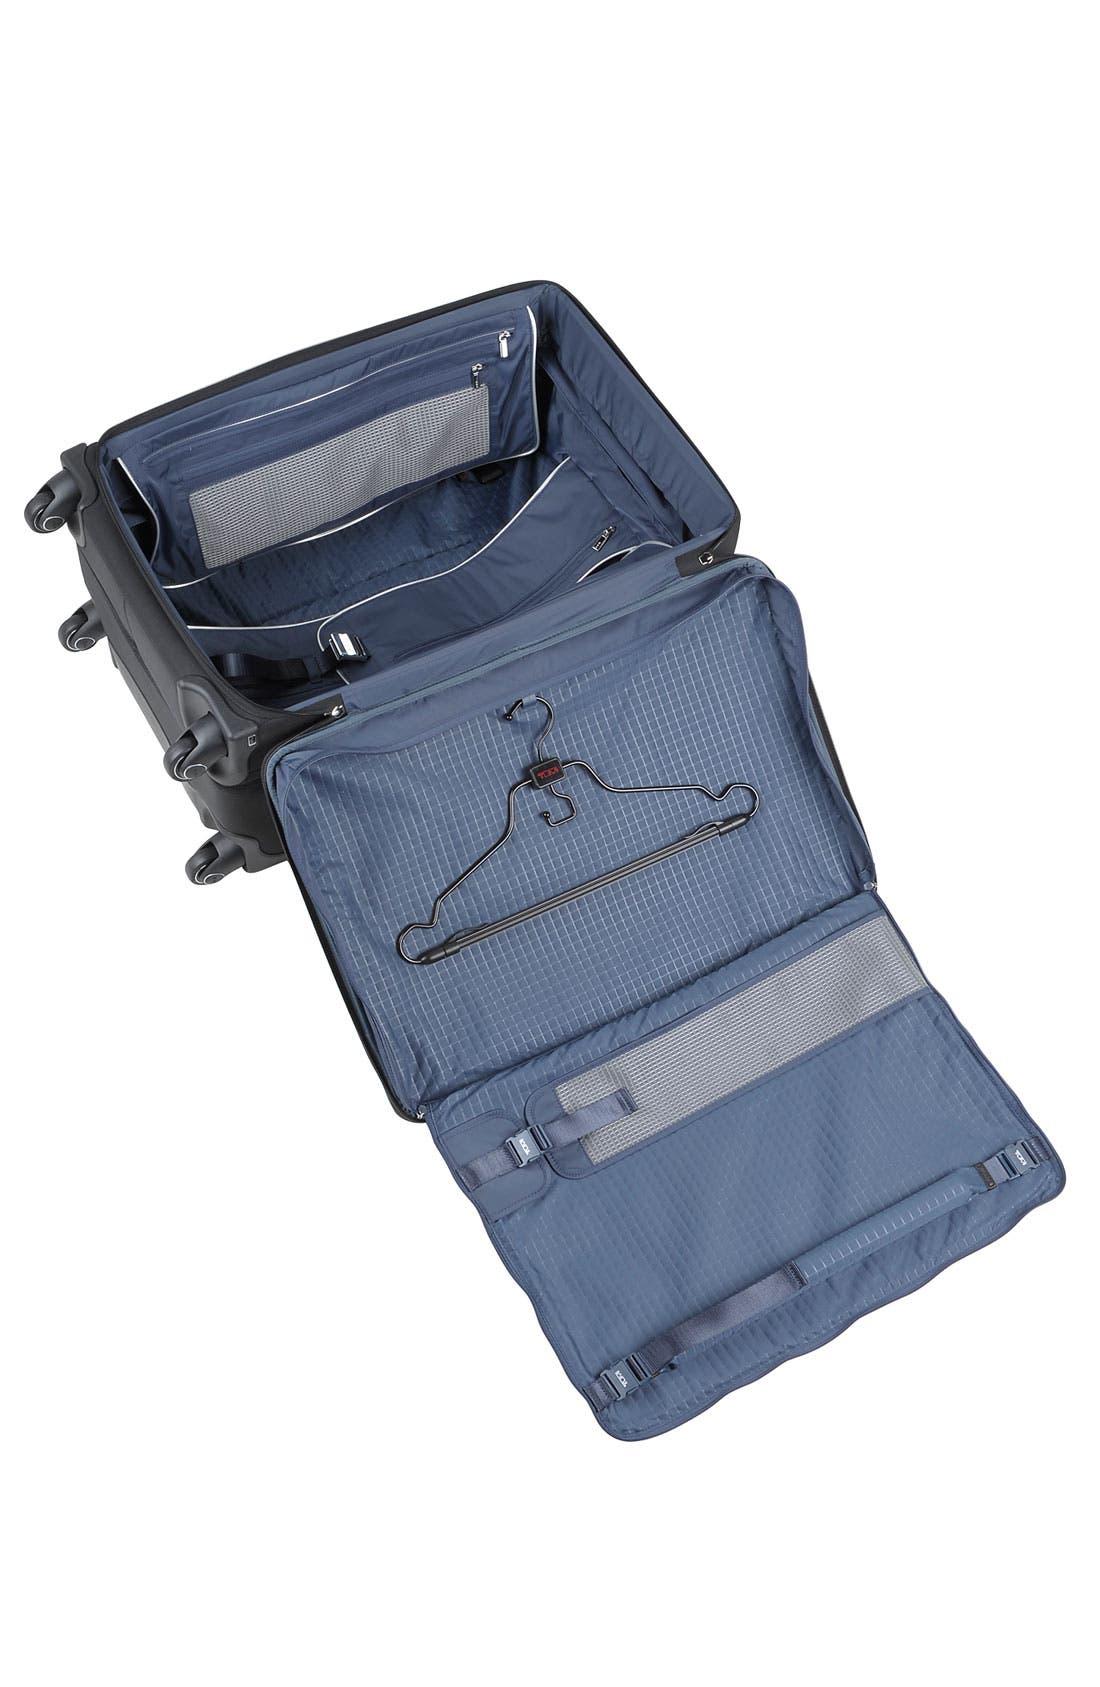 Alternate Image 3  - Tumi 'Arrivé - Camden' 4-Wheeled Expandable Long Trip Suitcase (27 Inch)